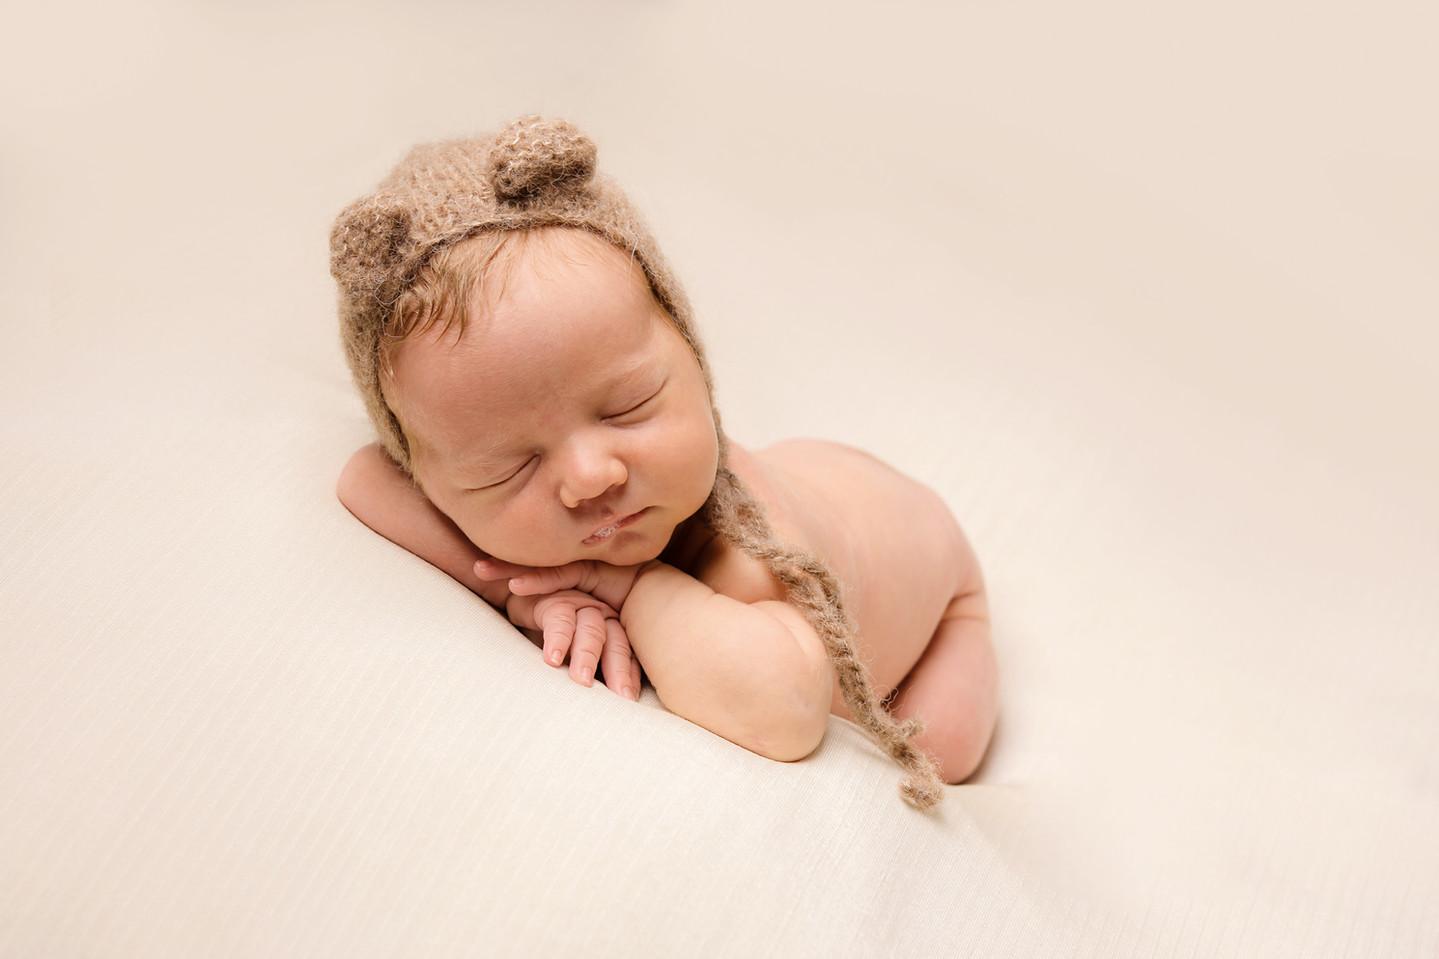 newborn baby photography studio clitheroe